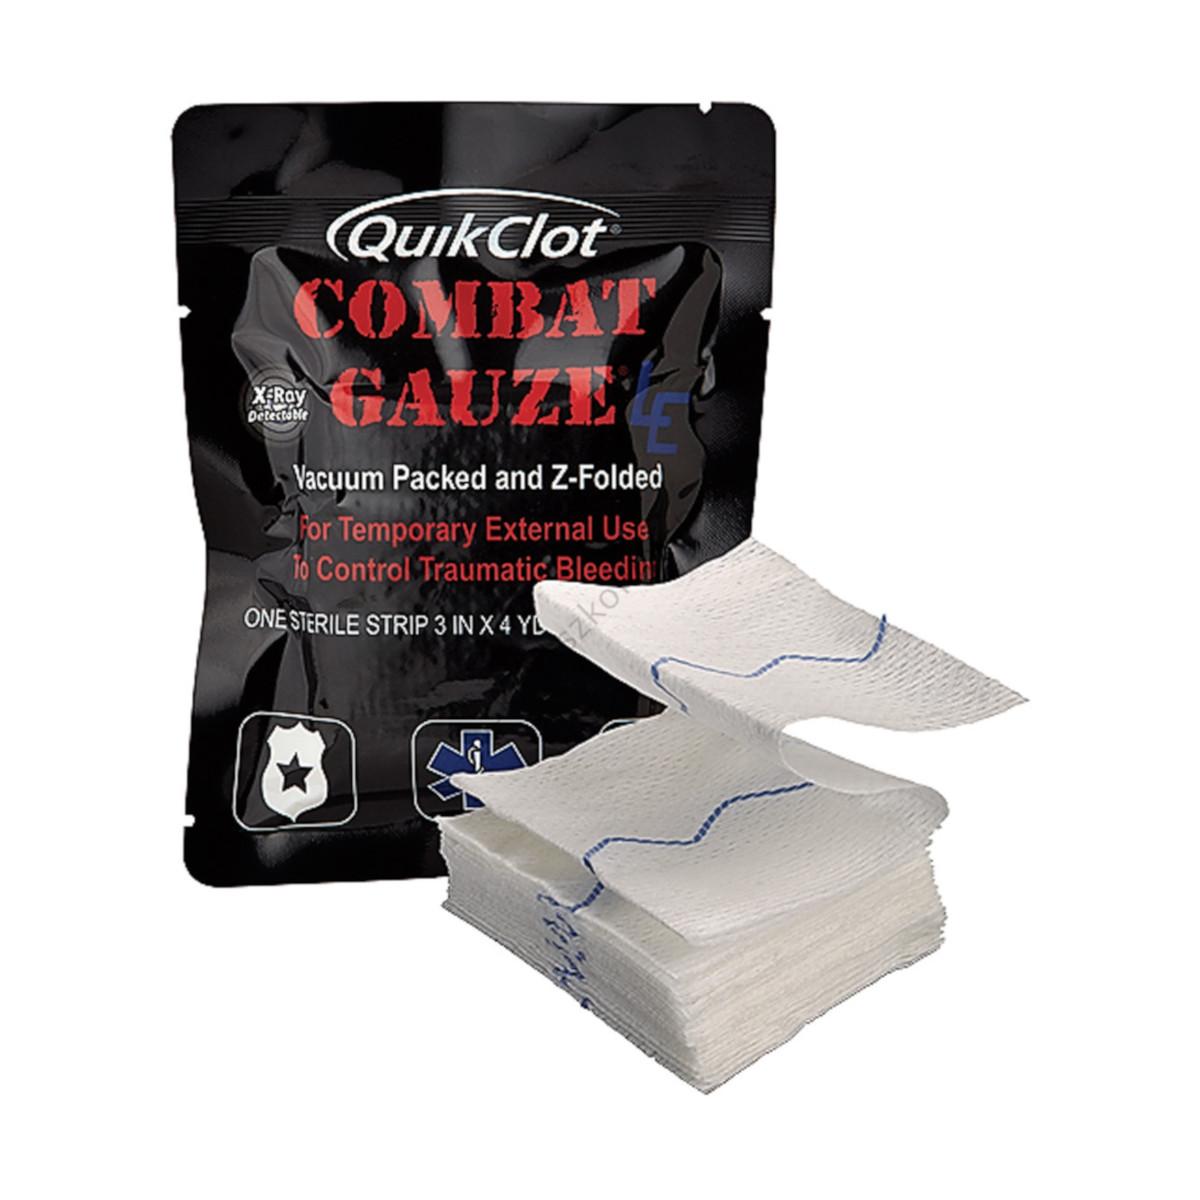 Opatrunek hemostatyczny QuikClot Combat Gauze LE